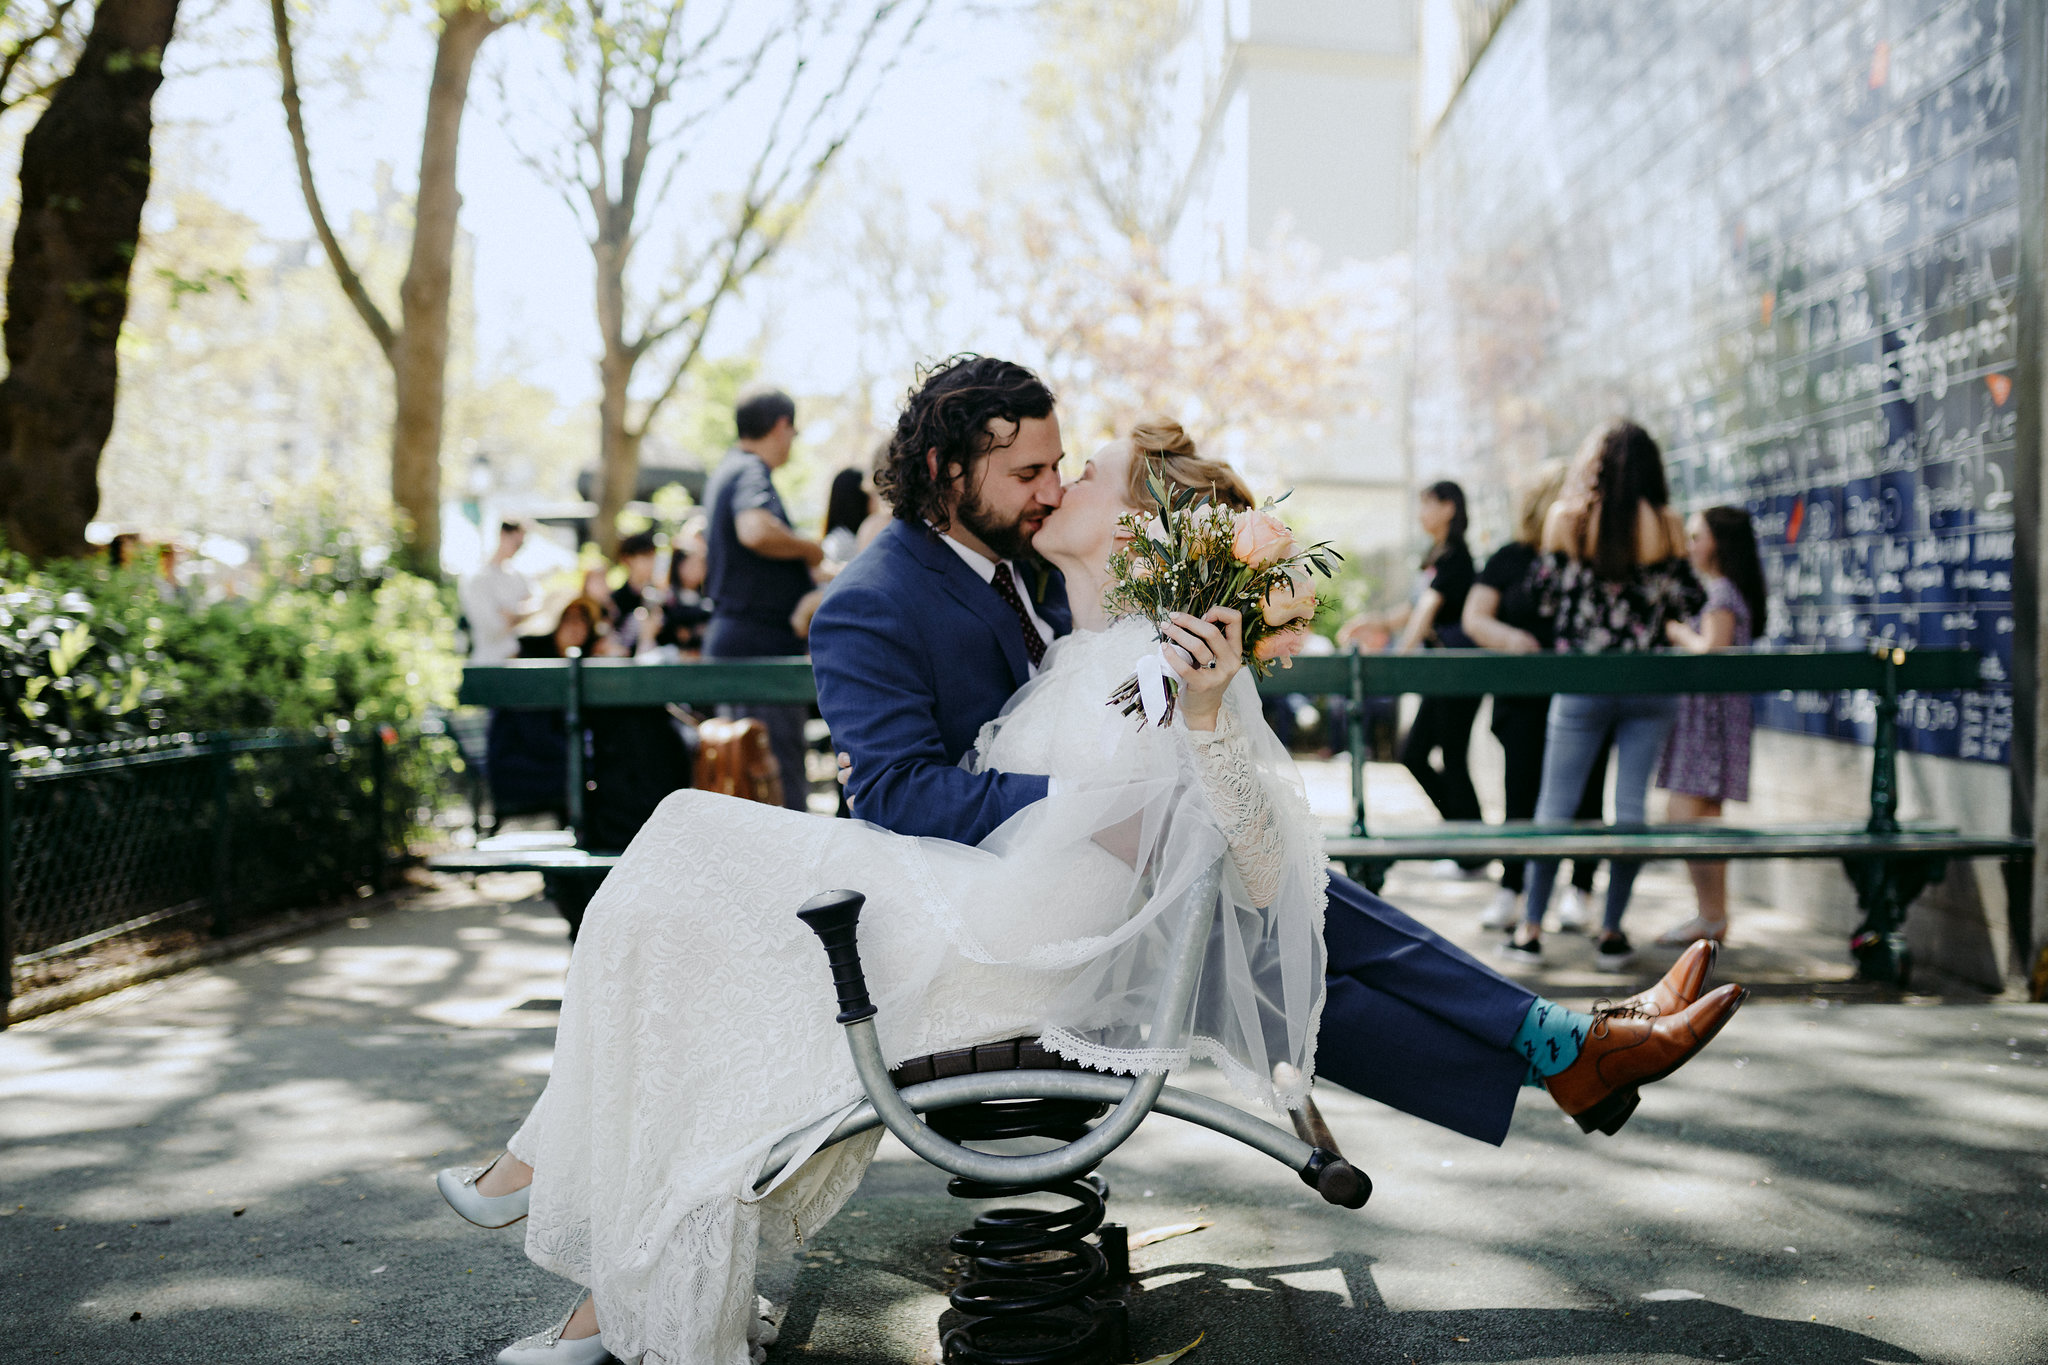 Paris_elopement_wedding_photographer-352.jpg